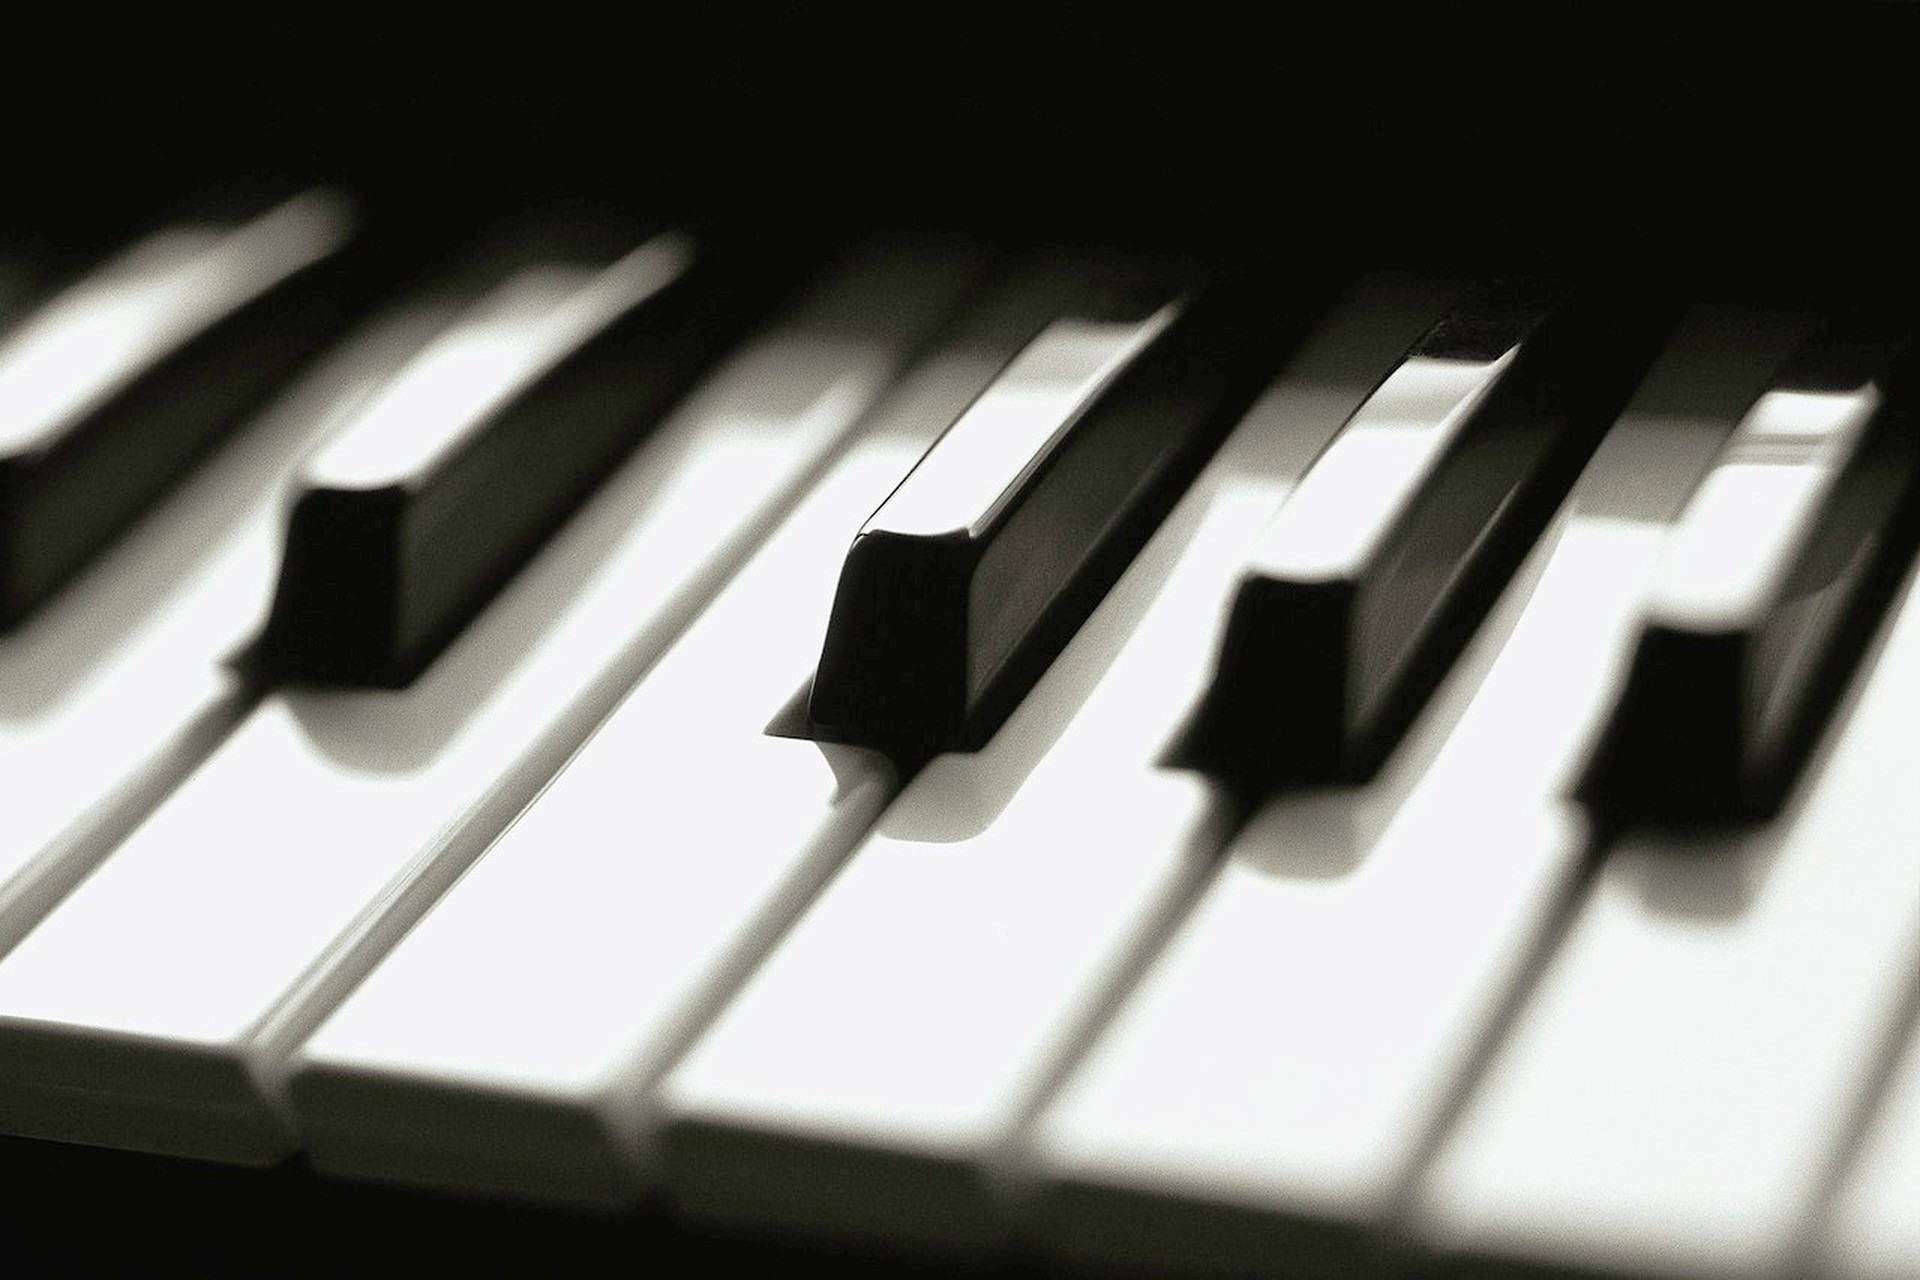 ВУдмуртии педагог музыки насиловал учениц иубил любовницу